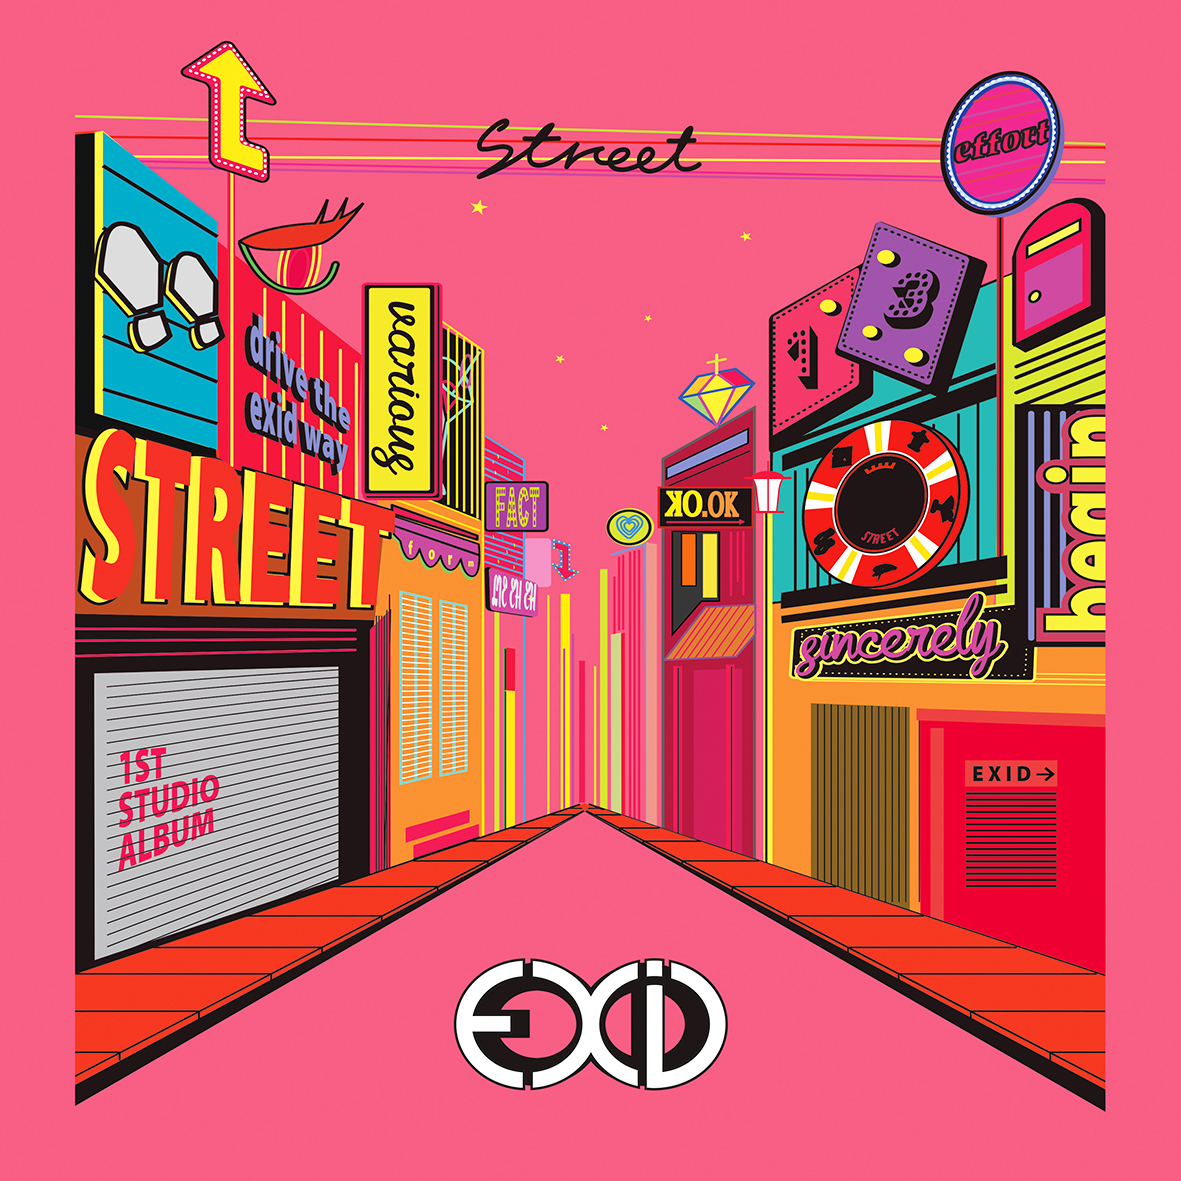 20180623.1547.07 EXID - Street cover.jpg